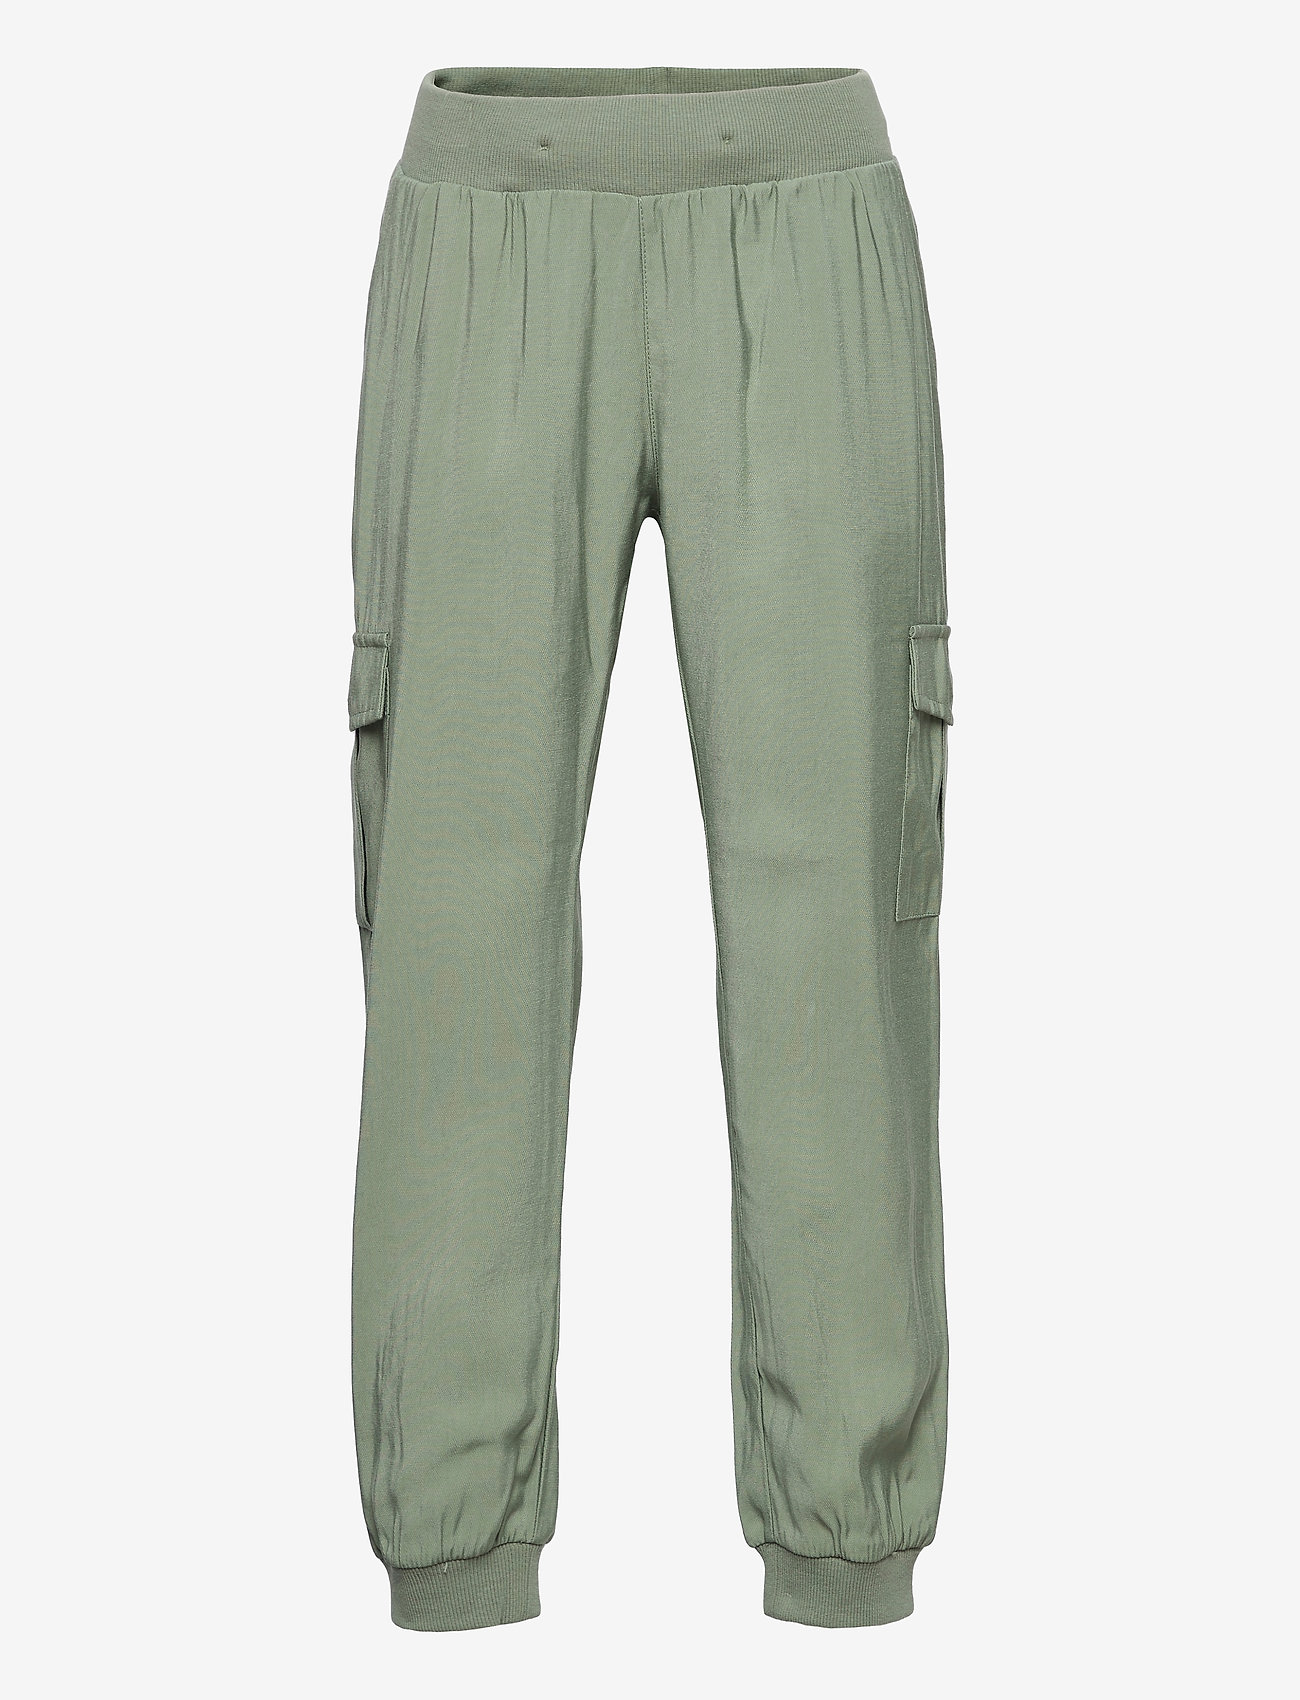 Lindex - Trousers Arlene2 - trousers - khaki - 0